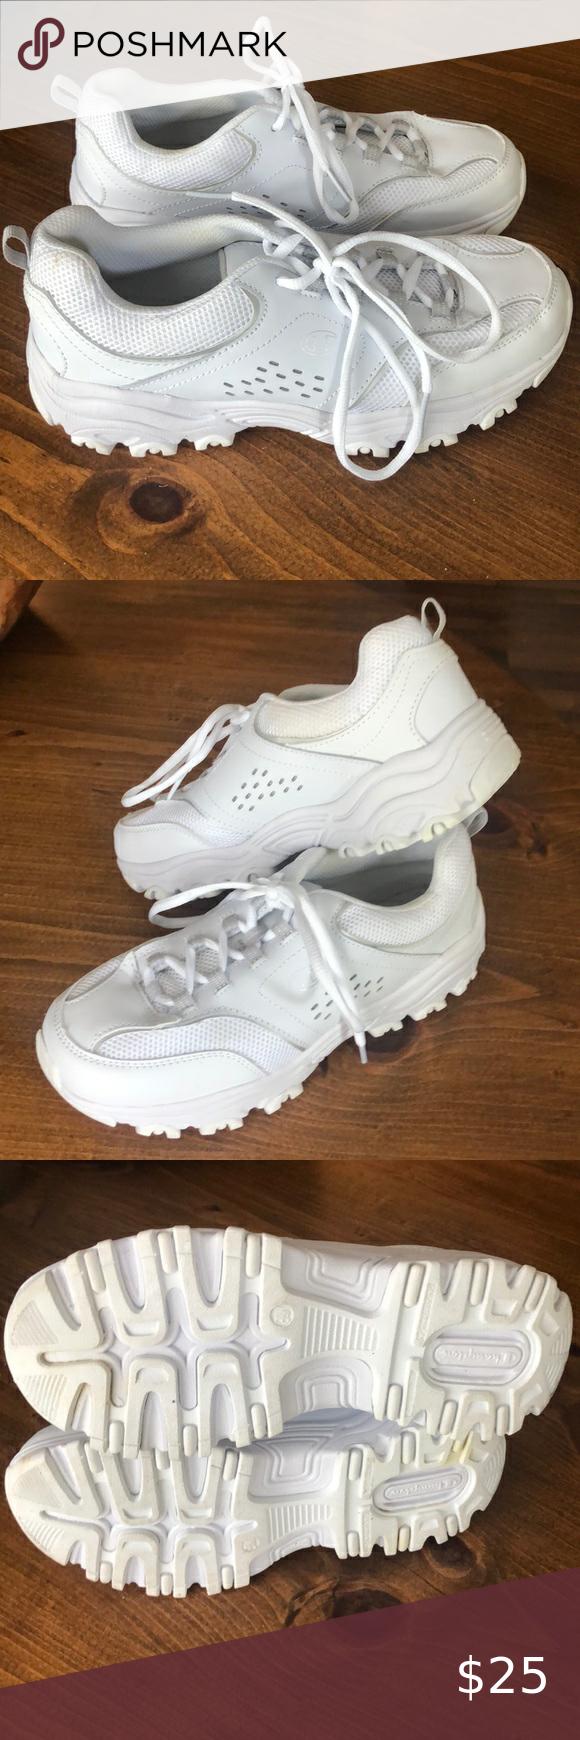 Champion shoes, Memory foam